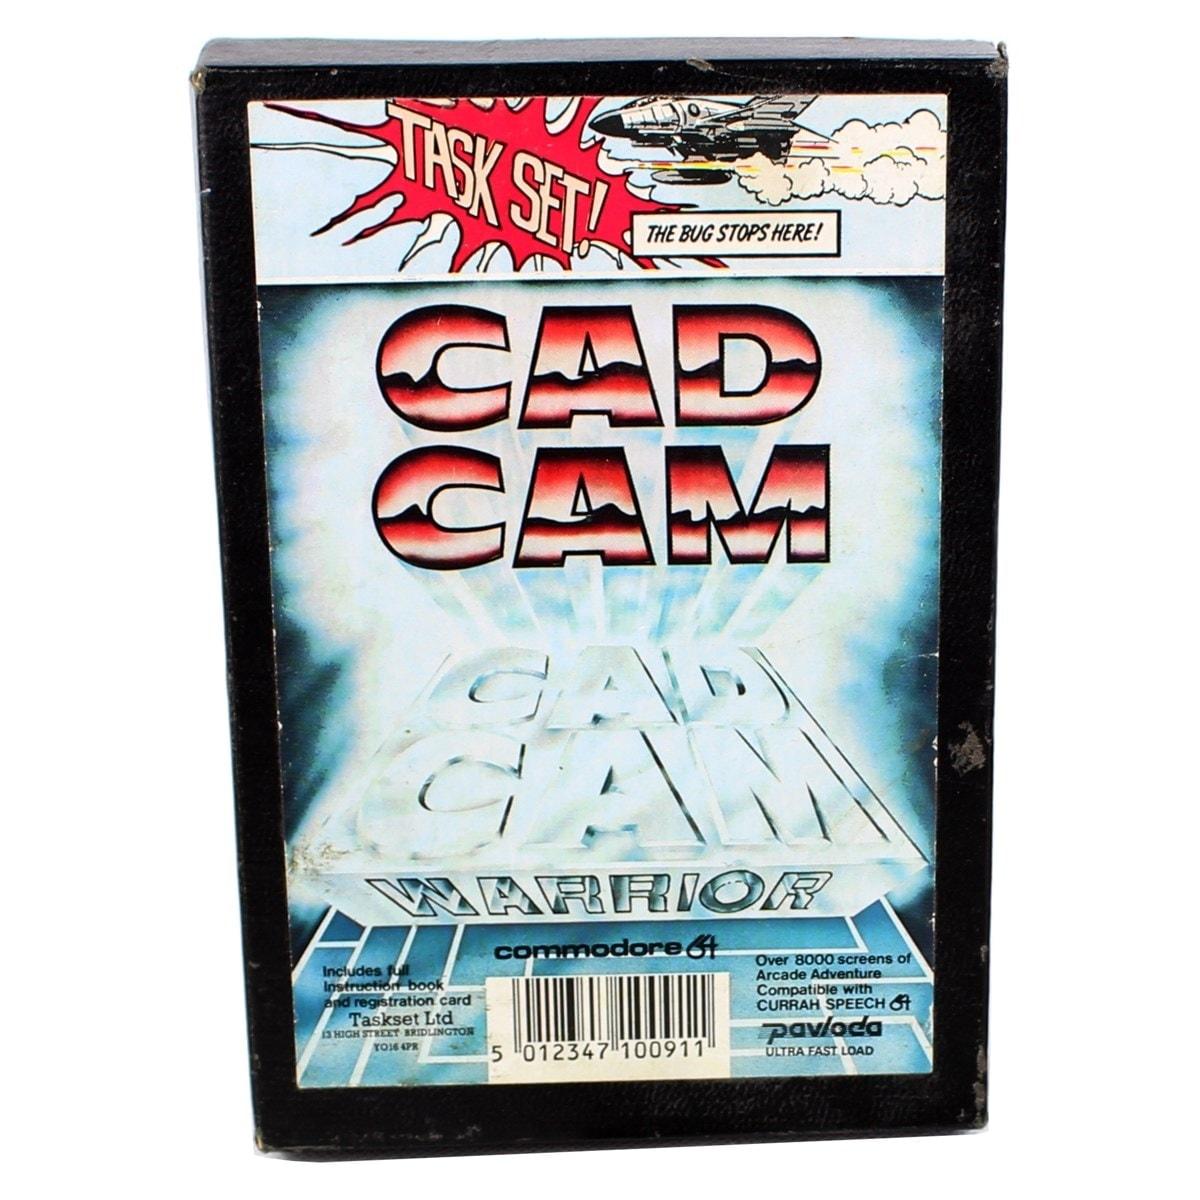 Cad Cam Warrior (C64 Cassette)